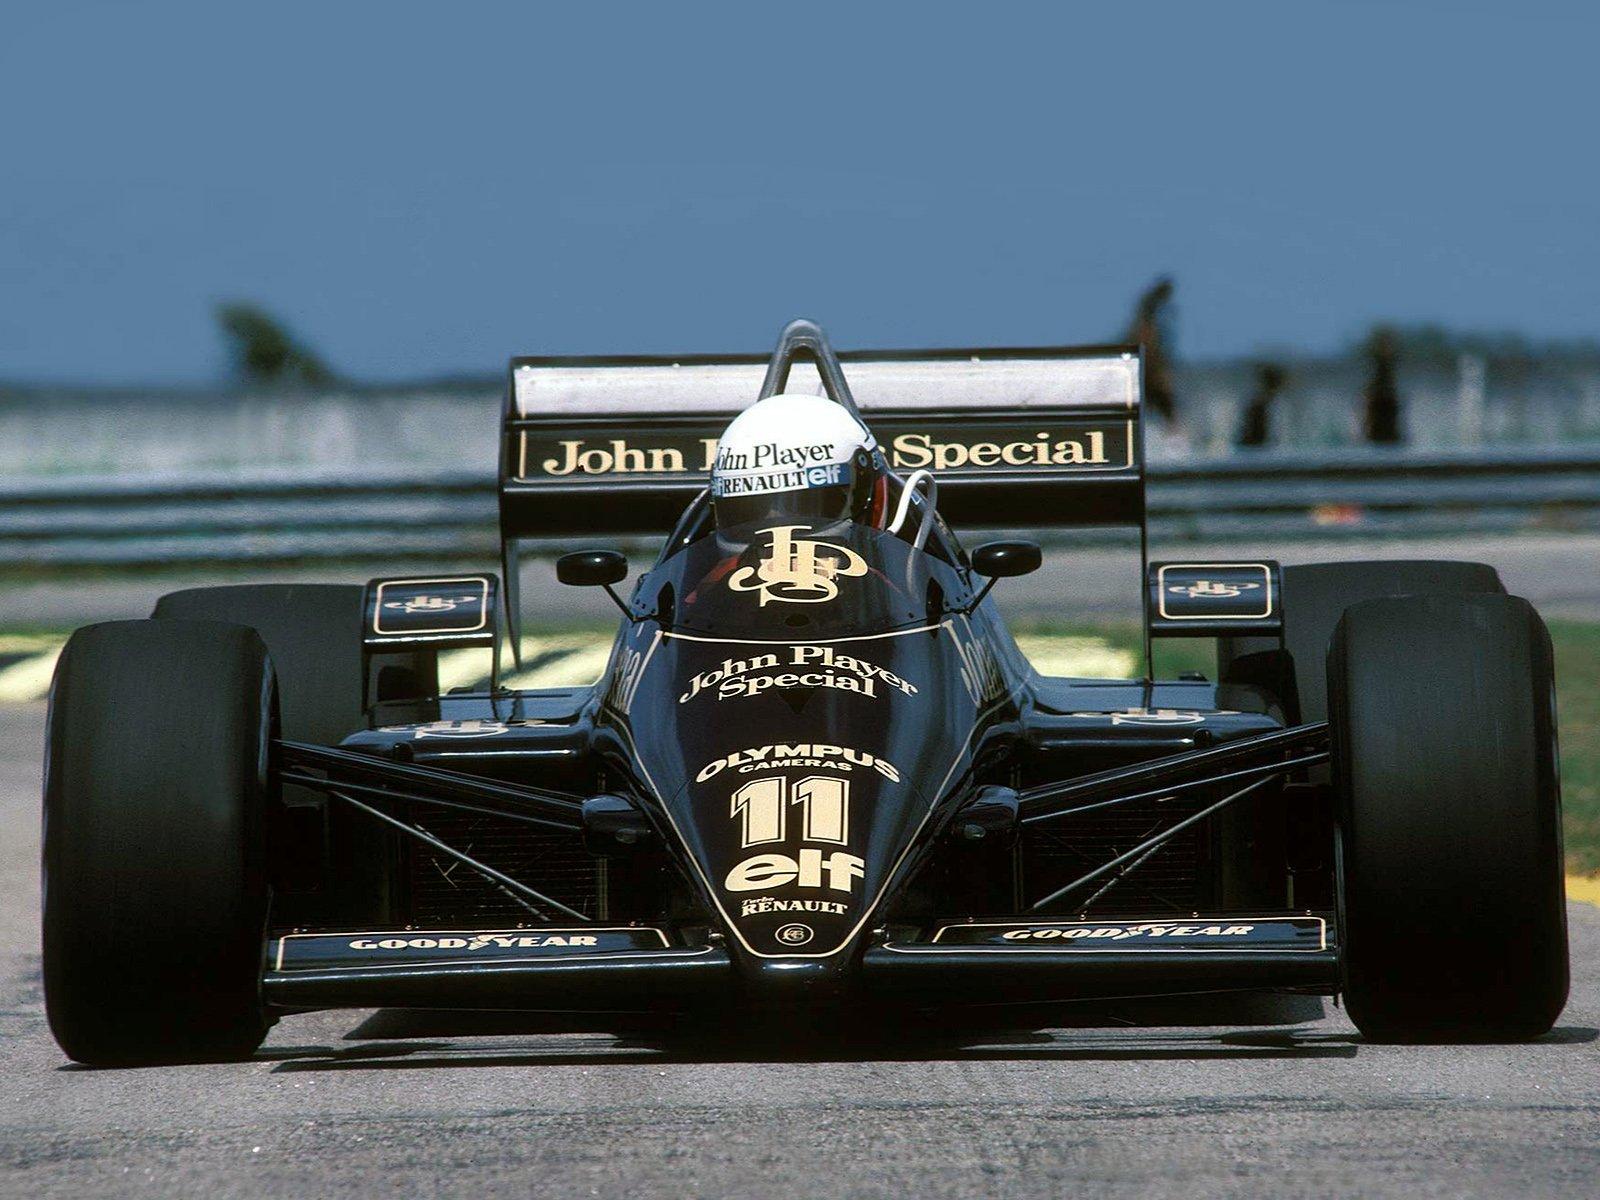 1985_Lotus_97T_Formula_f_1_race_racing___d_1600x1200